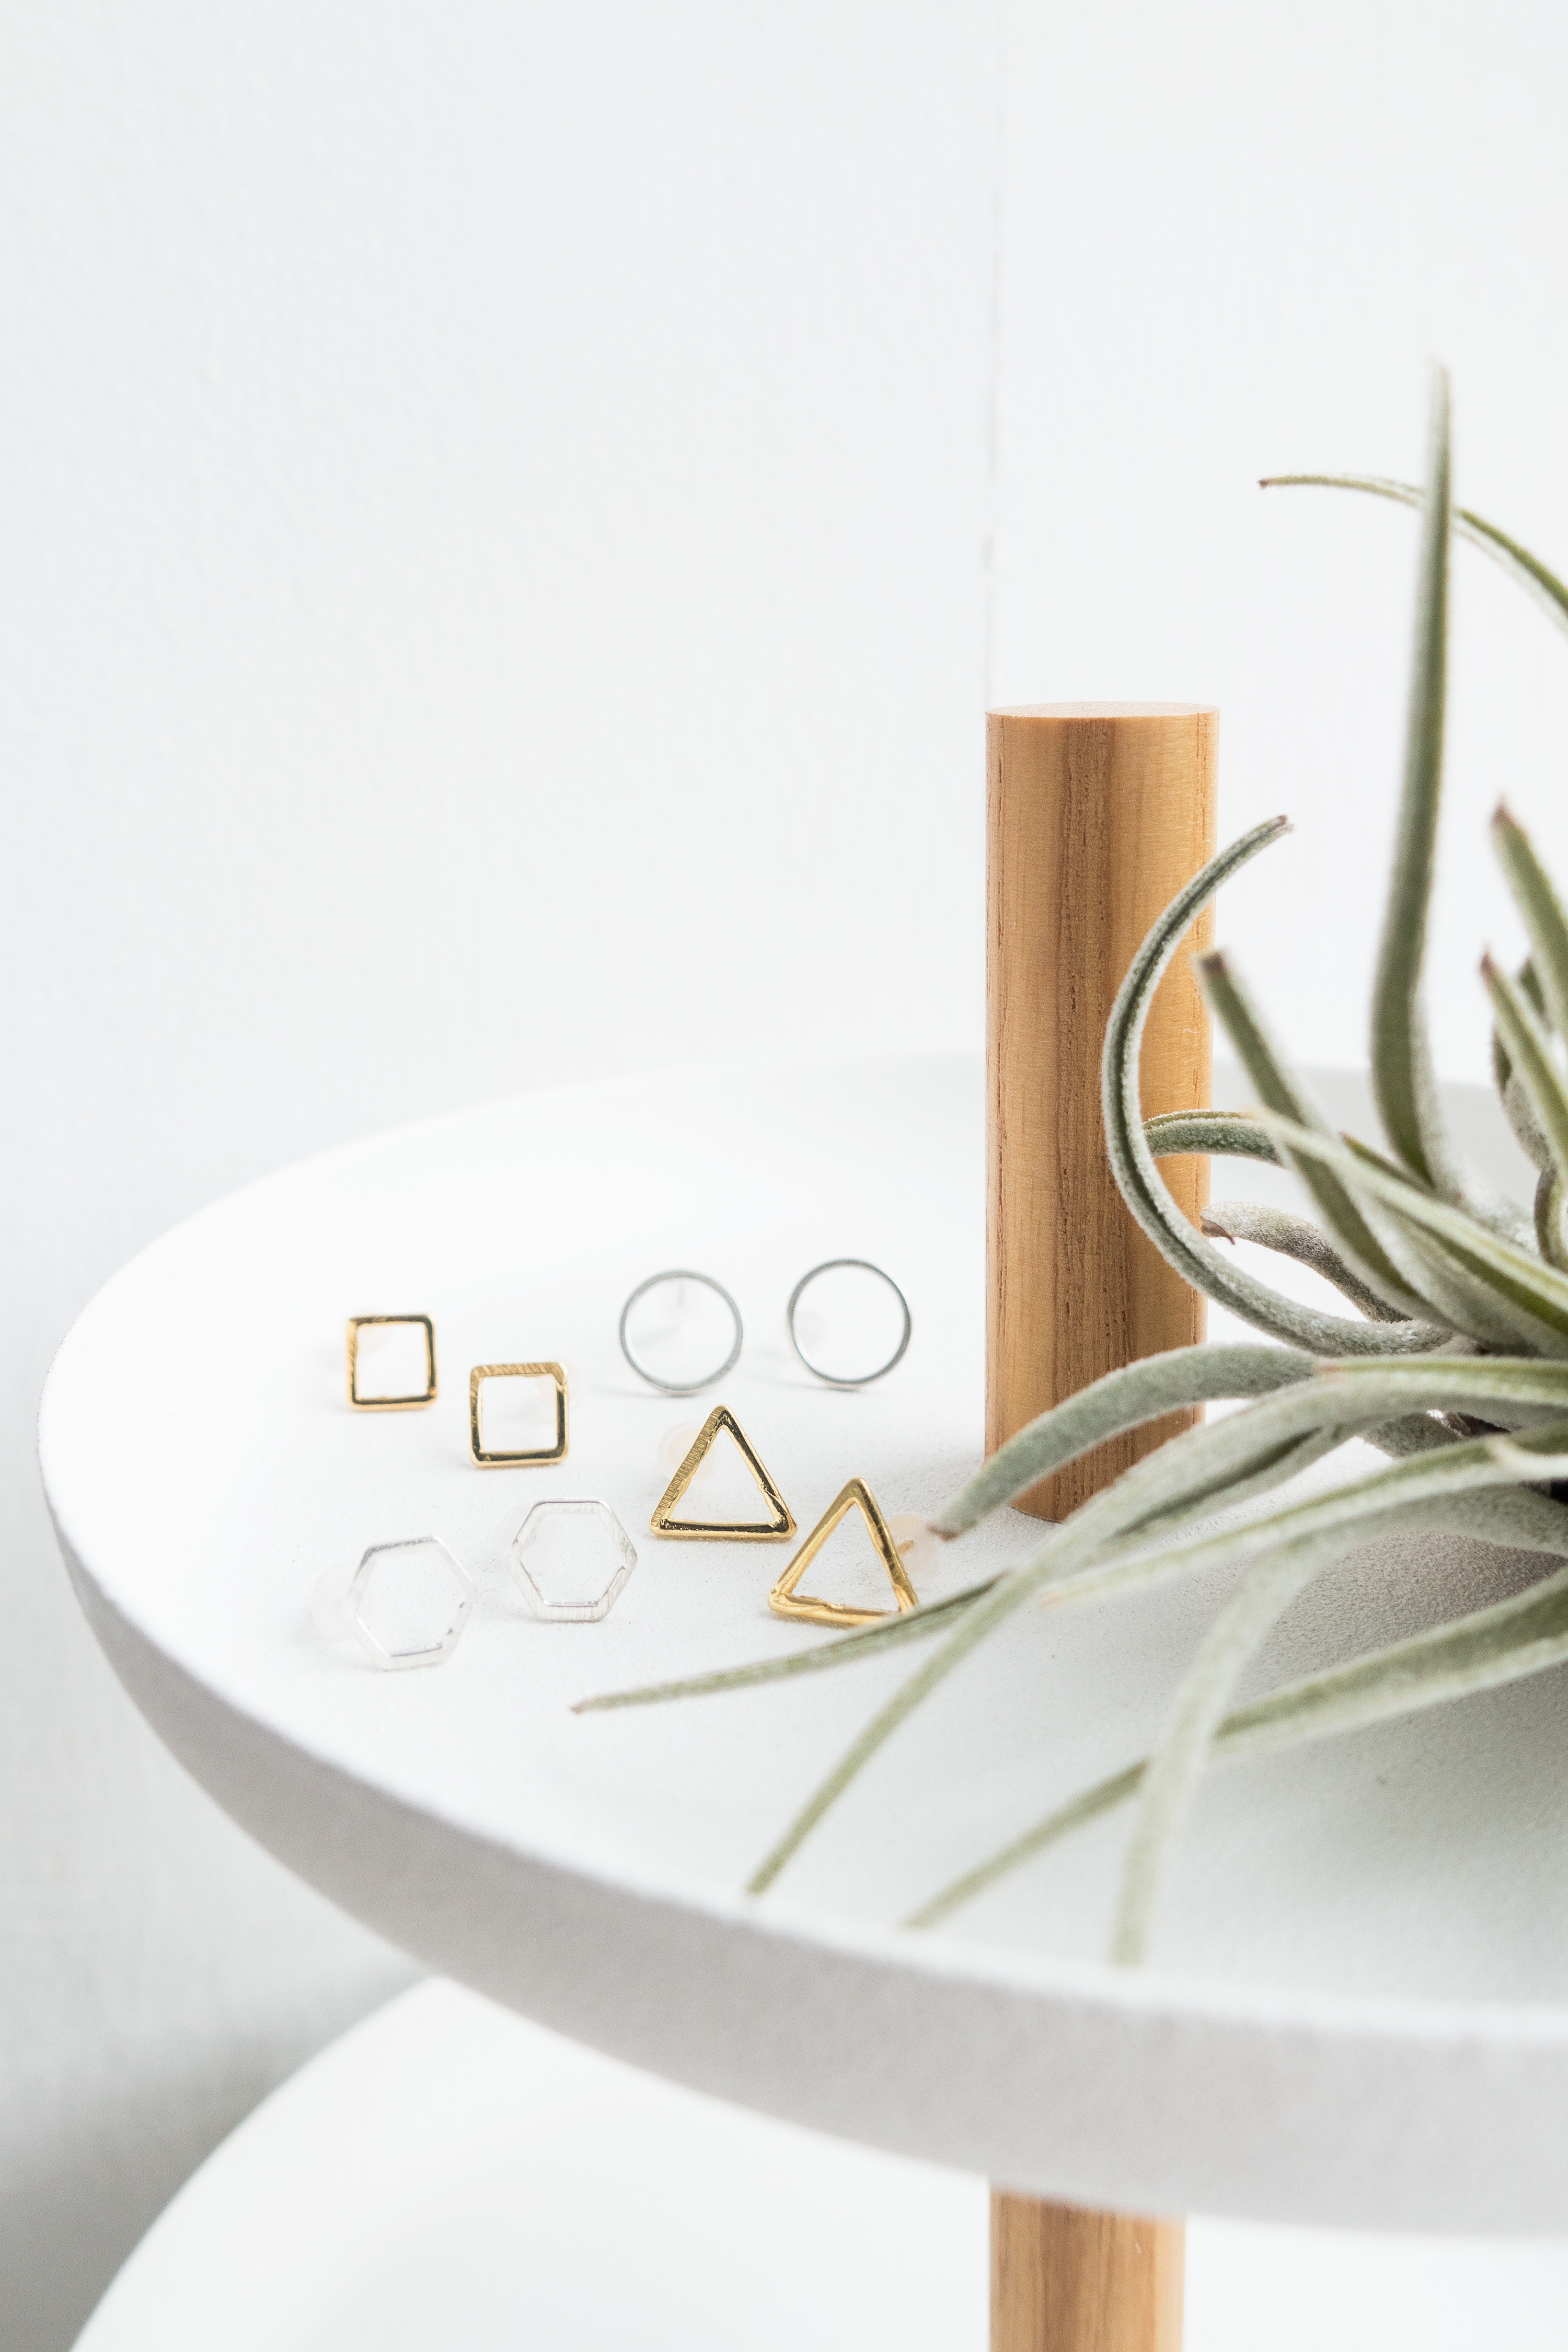 Introducing: Geometric Earrings